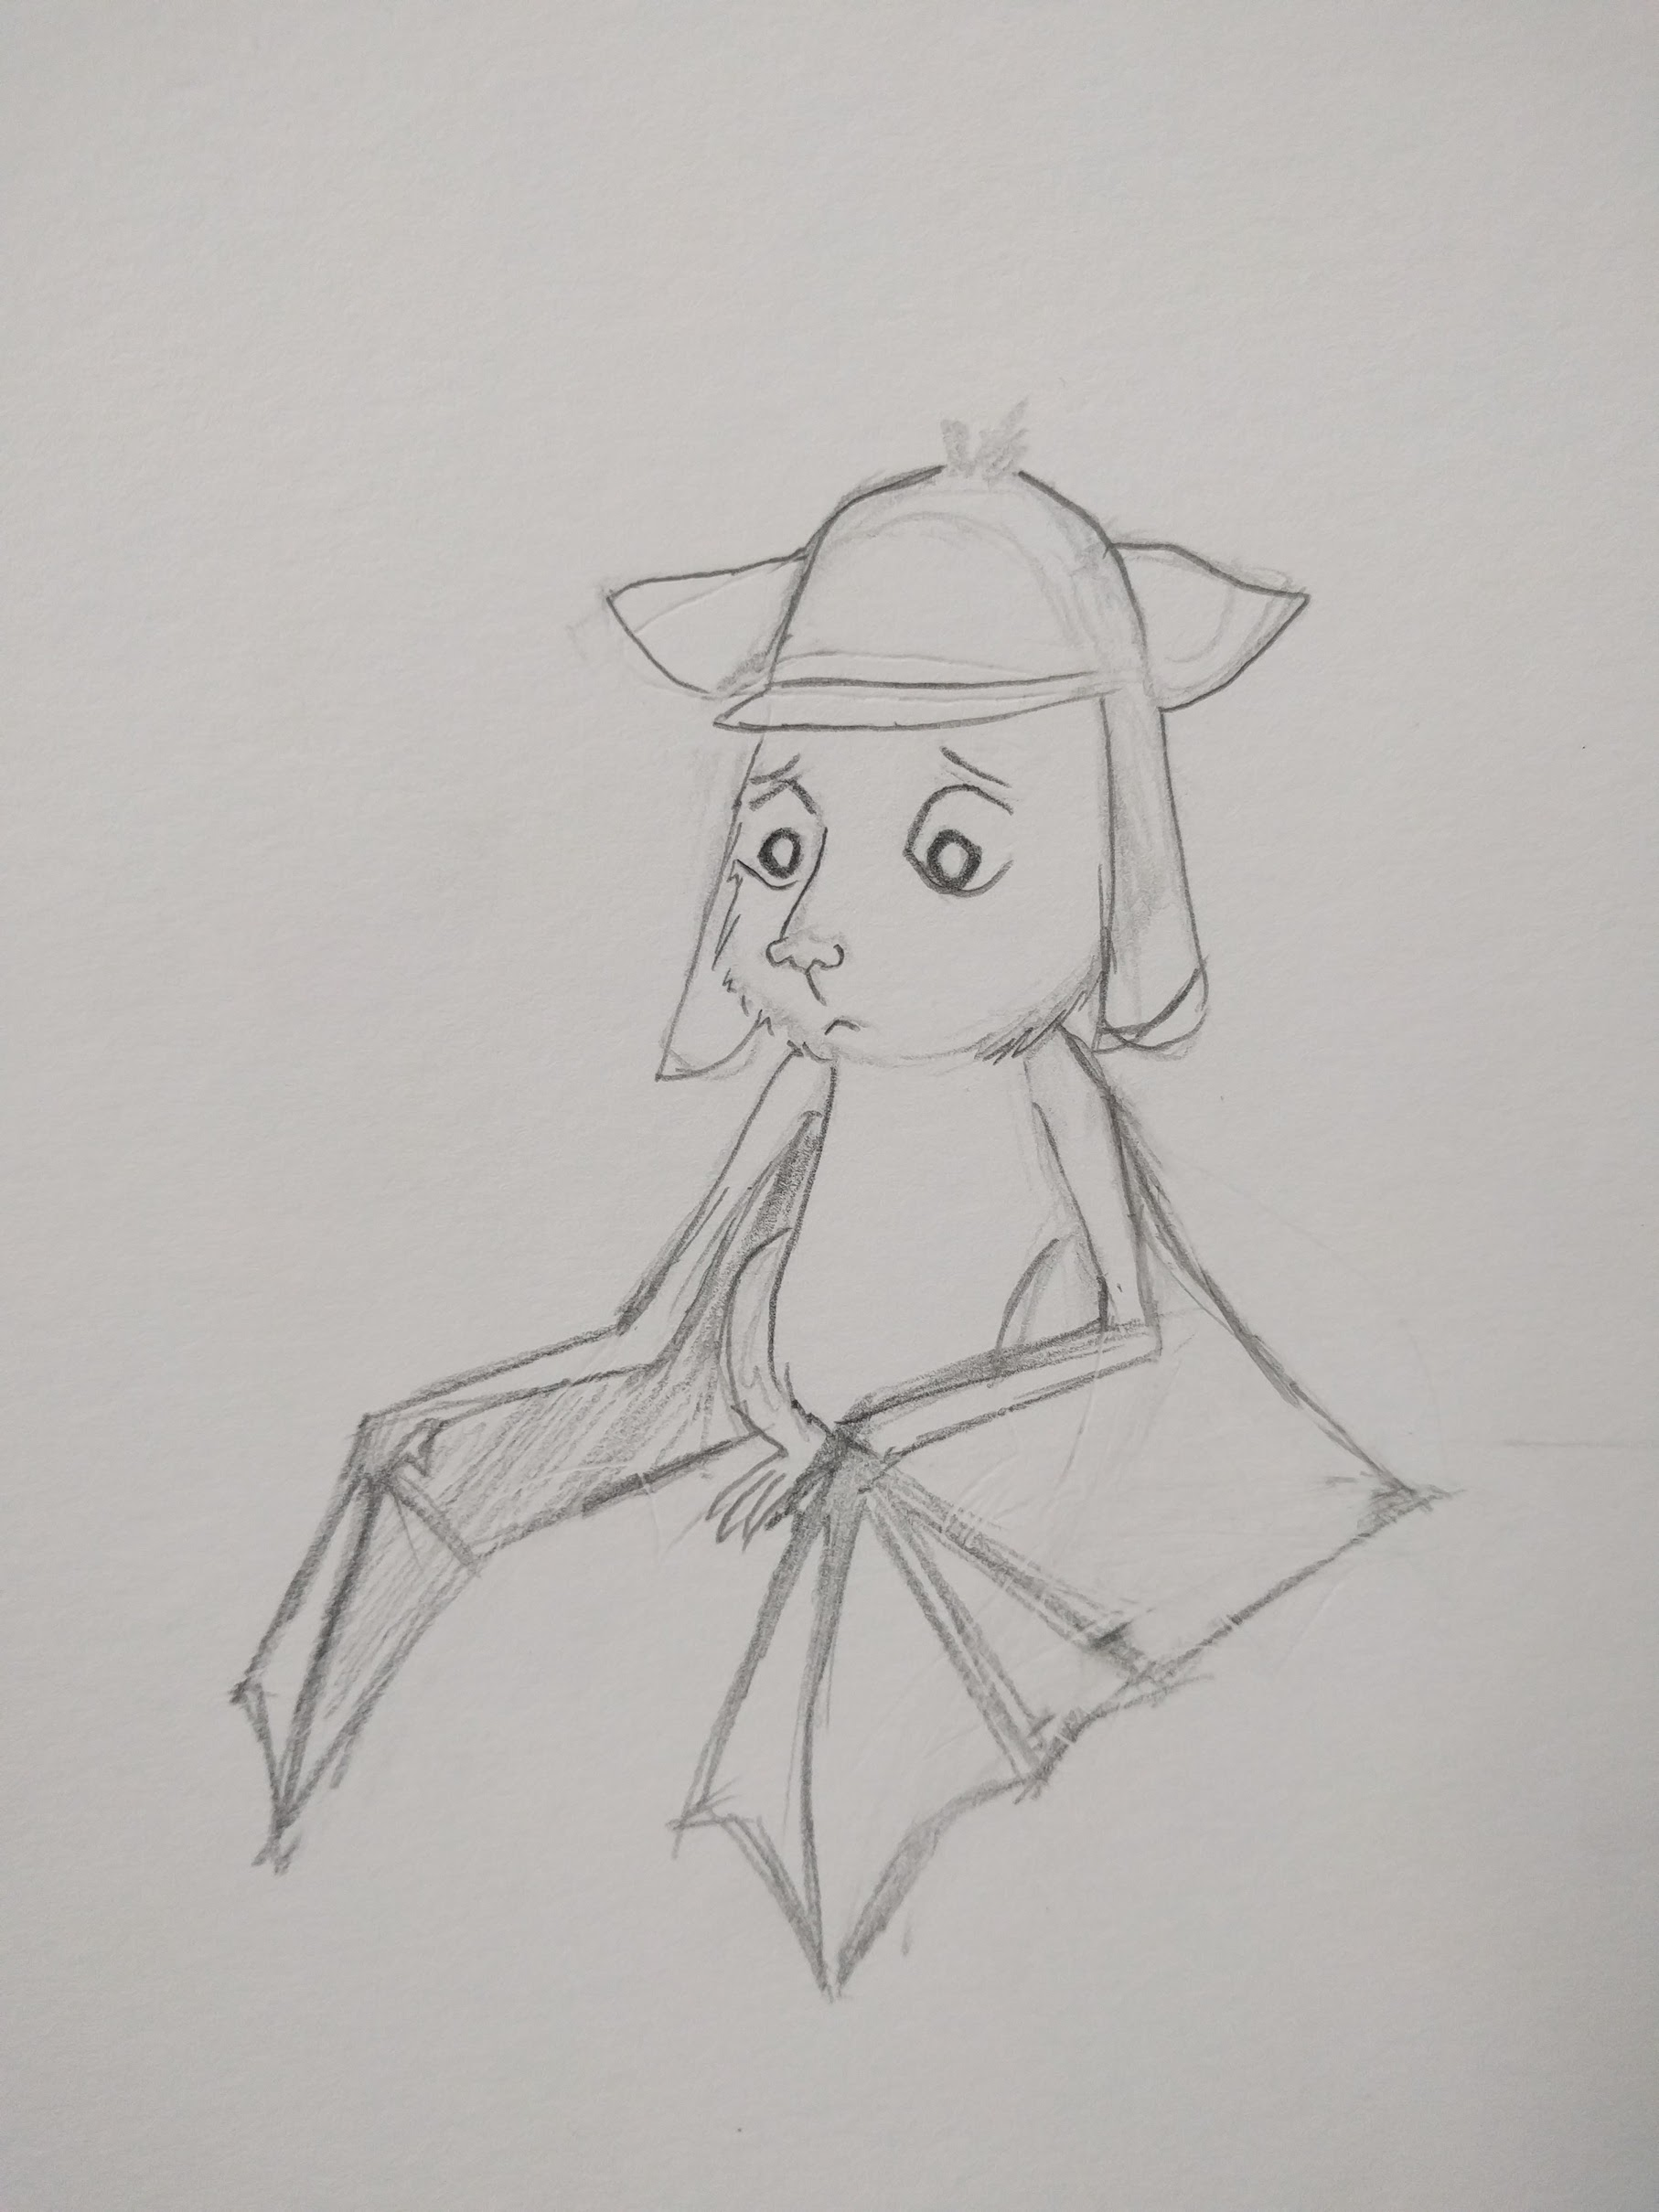 little_bat_sketch_02.jpg